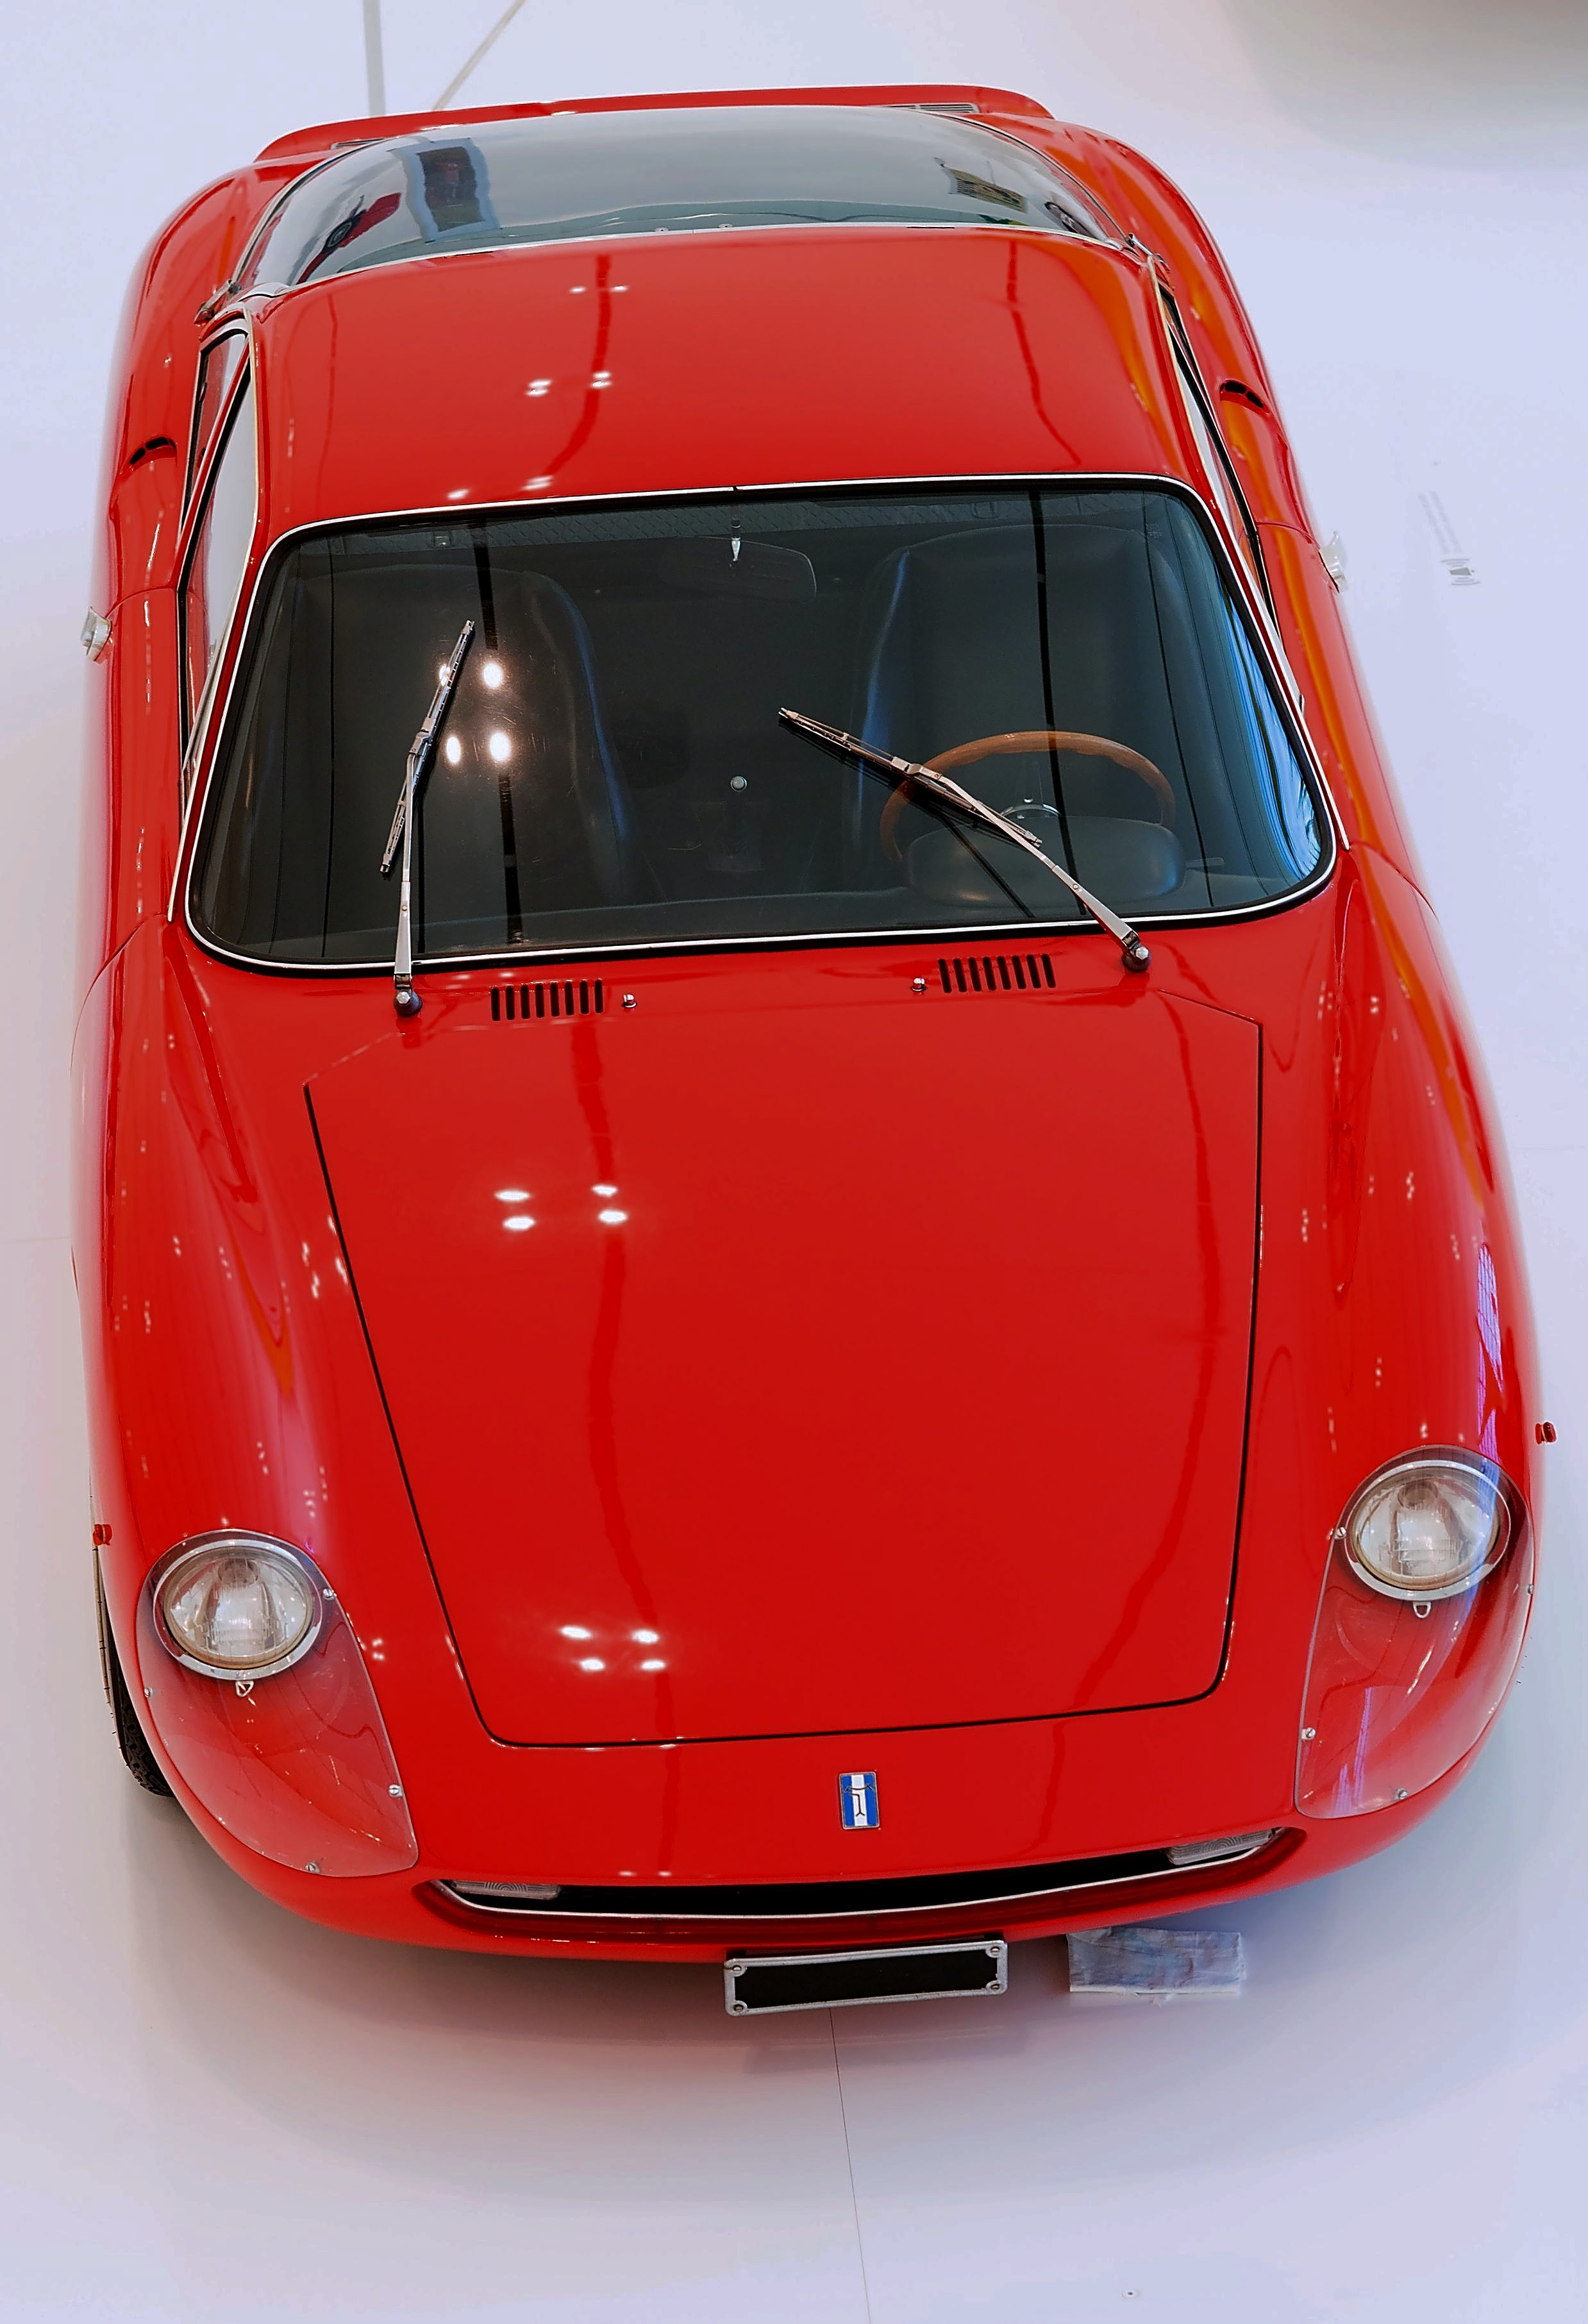 1965 De Tomaso Vallelunga (4)_filtered